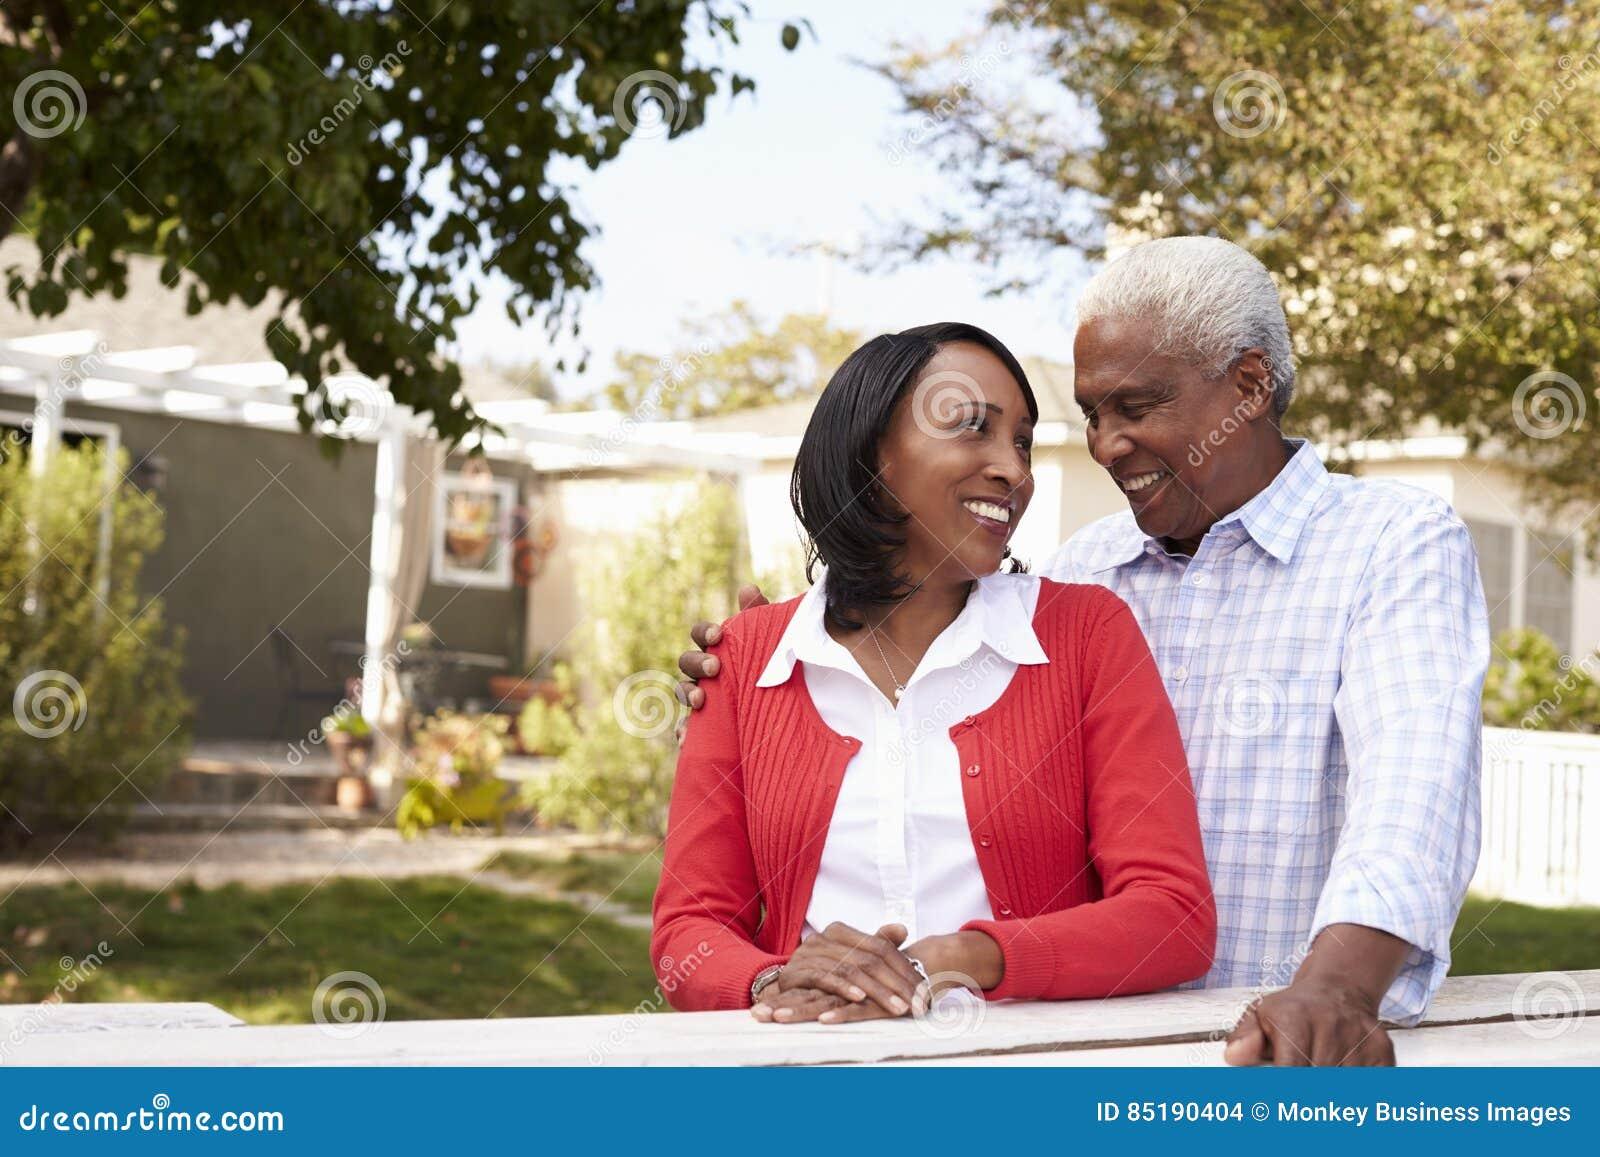 Senior black couple standing outside their new house